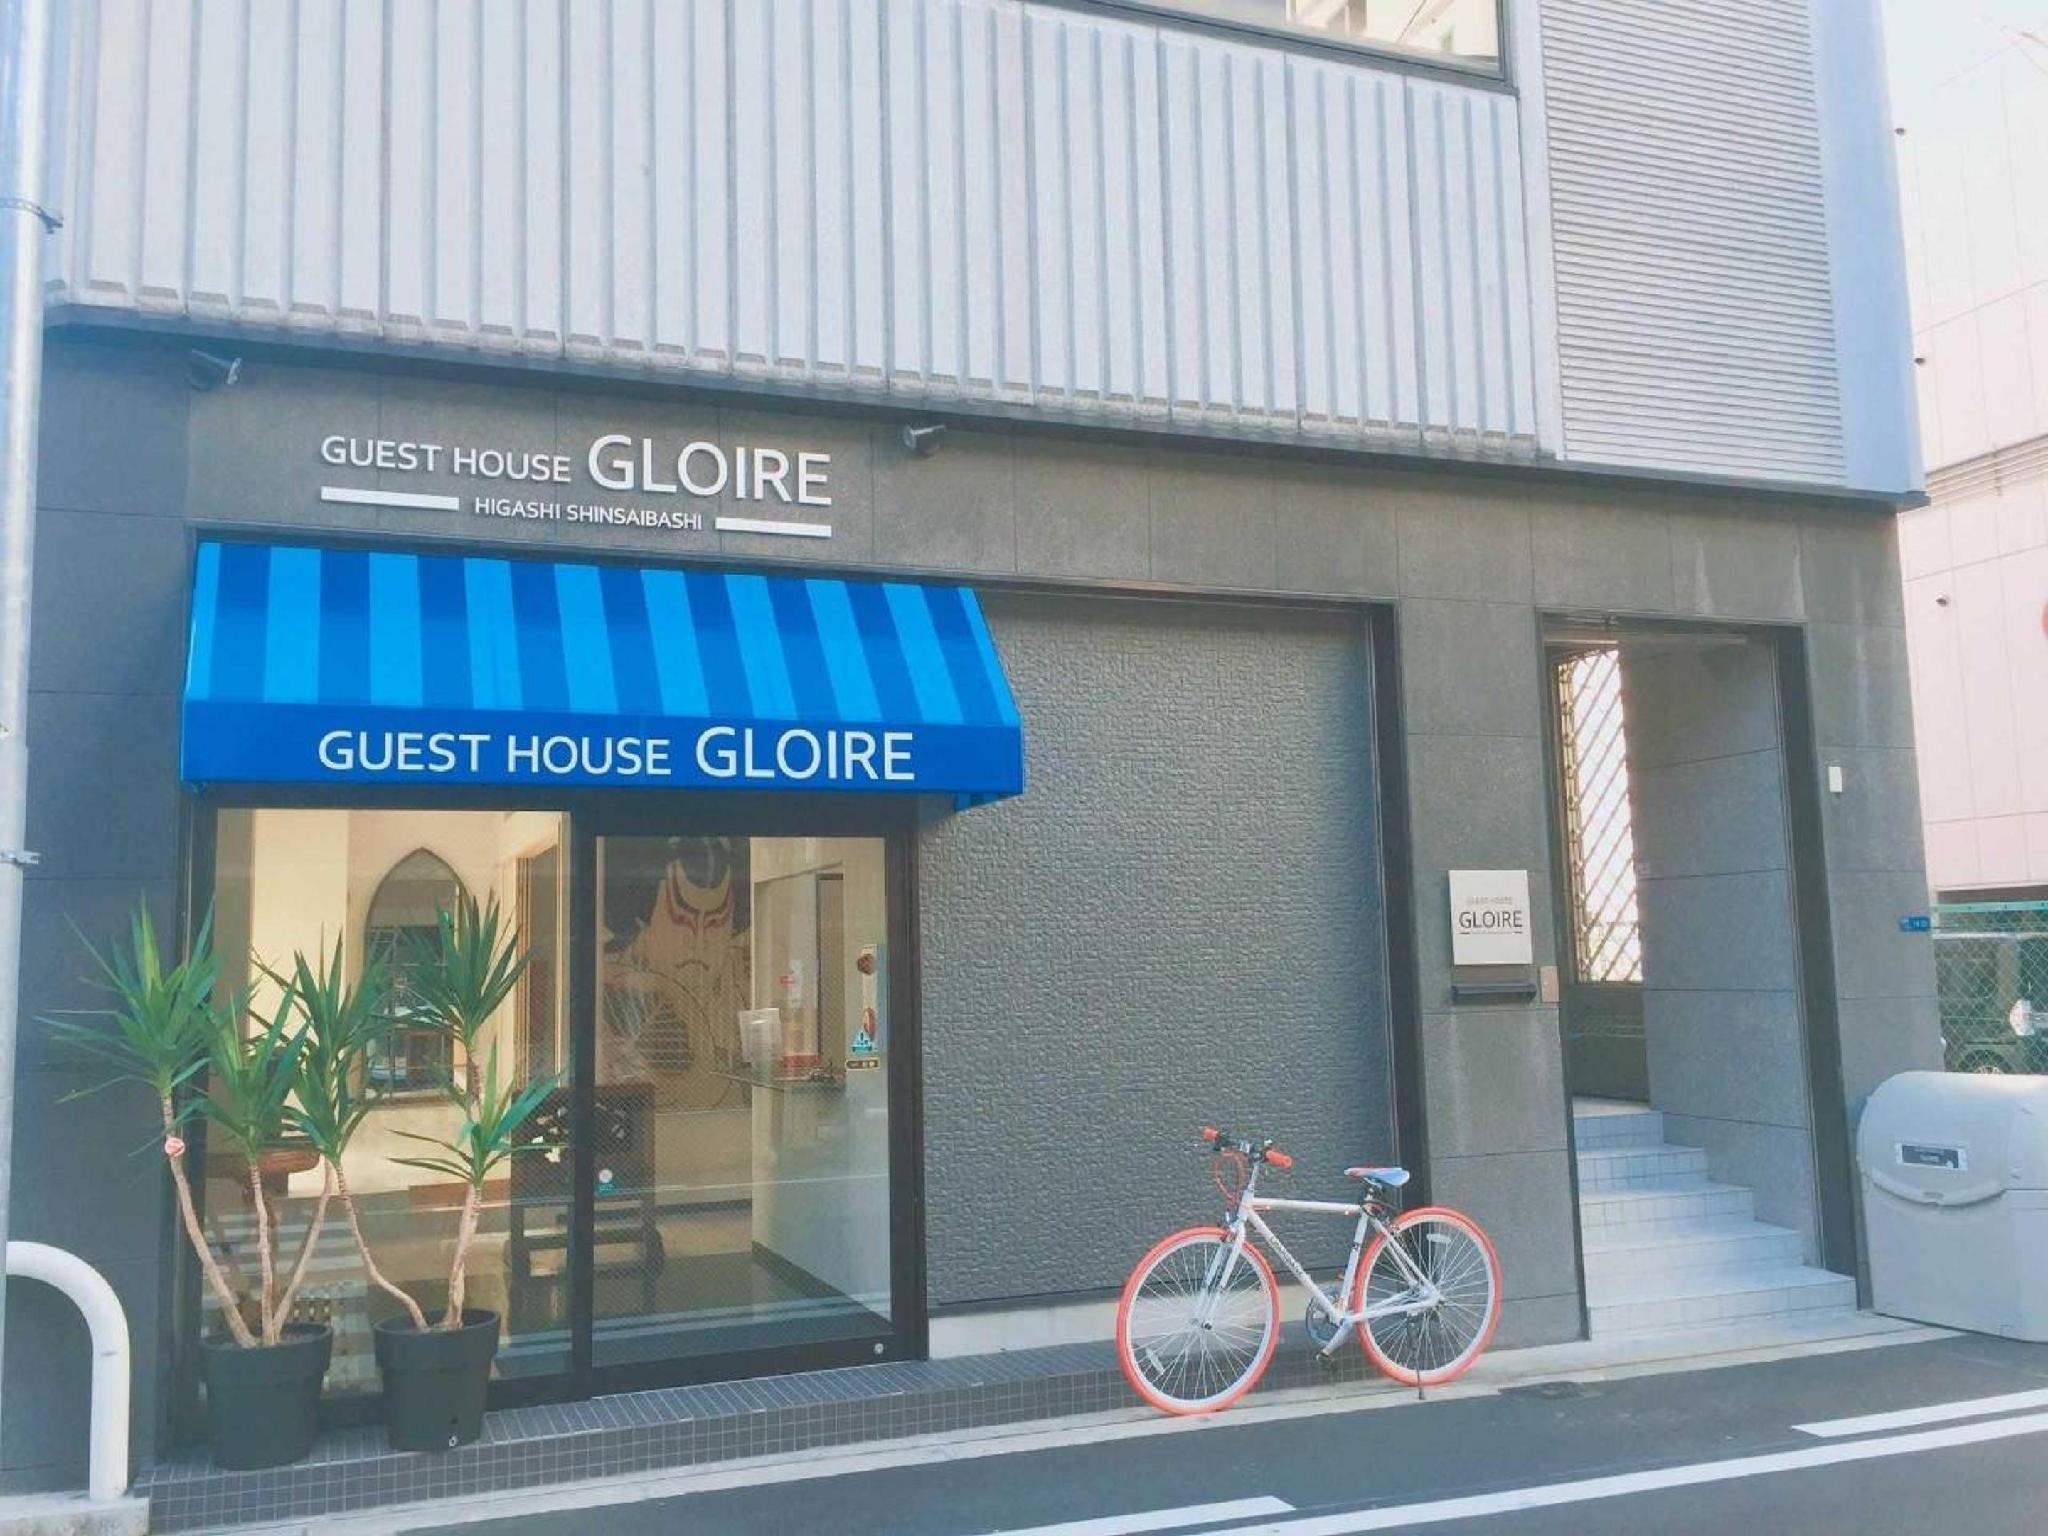 Guest House Gloire